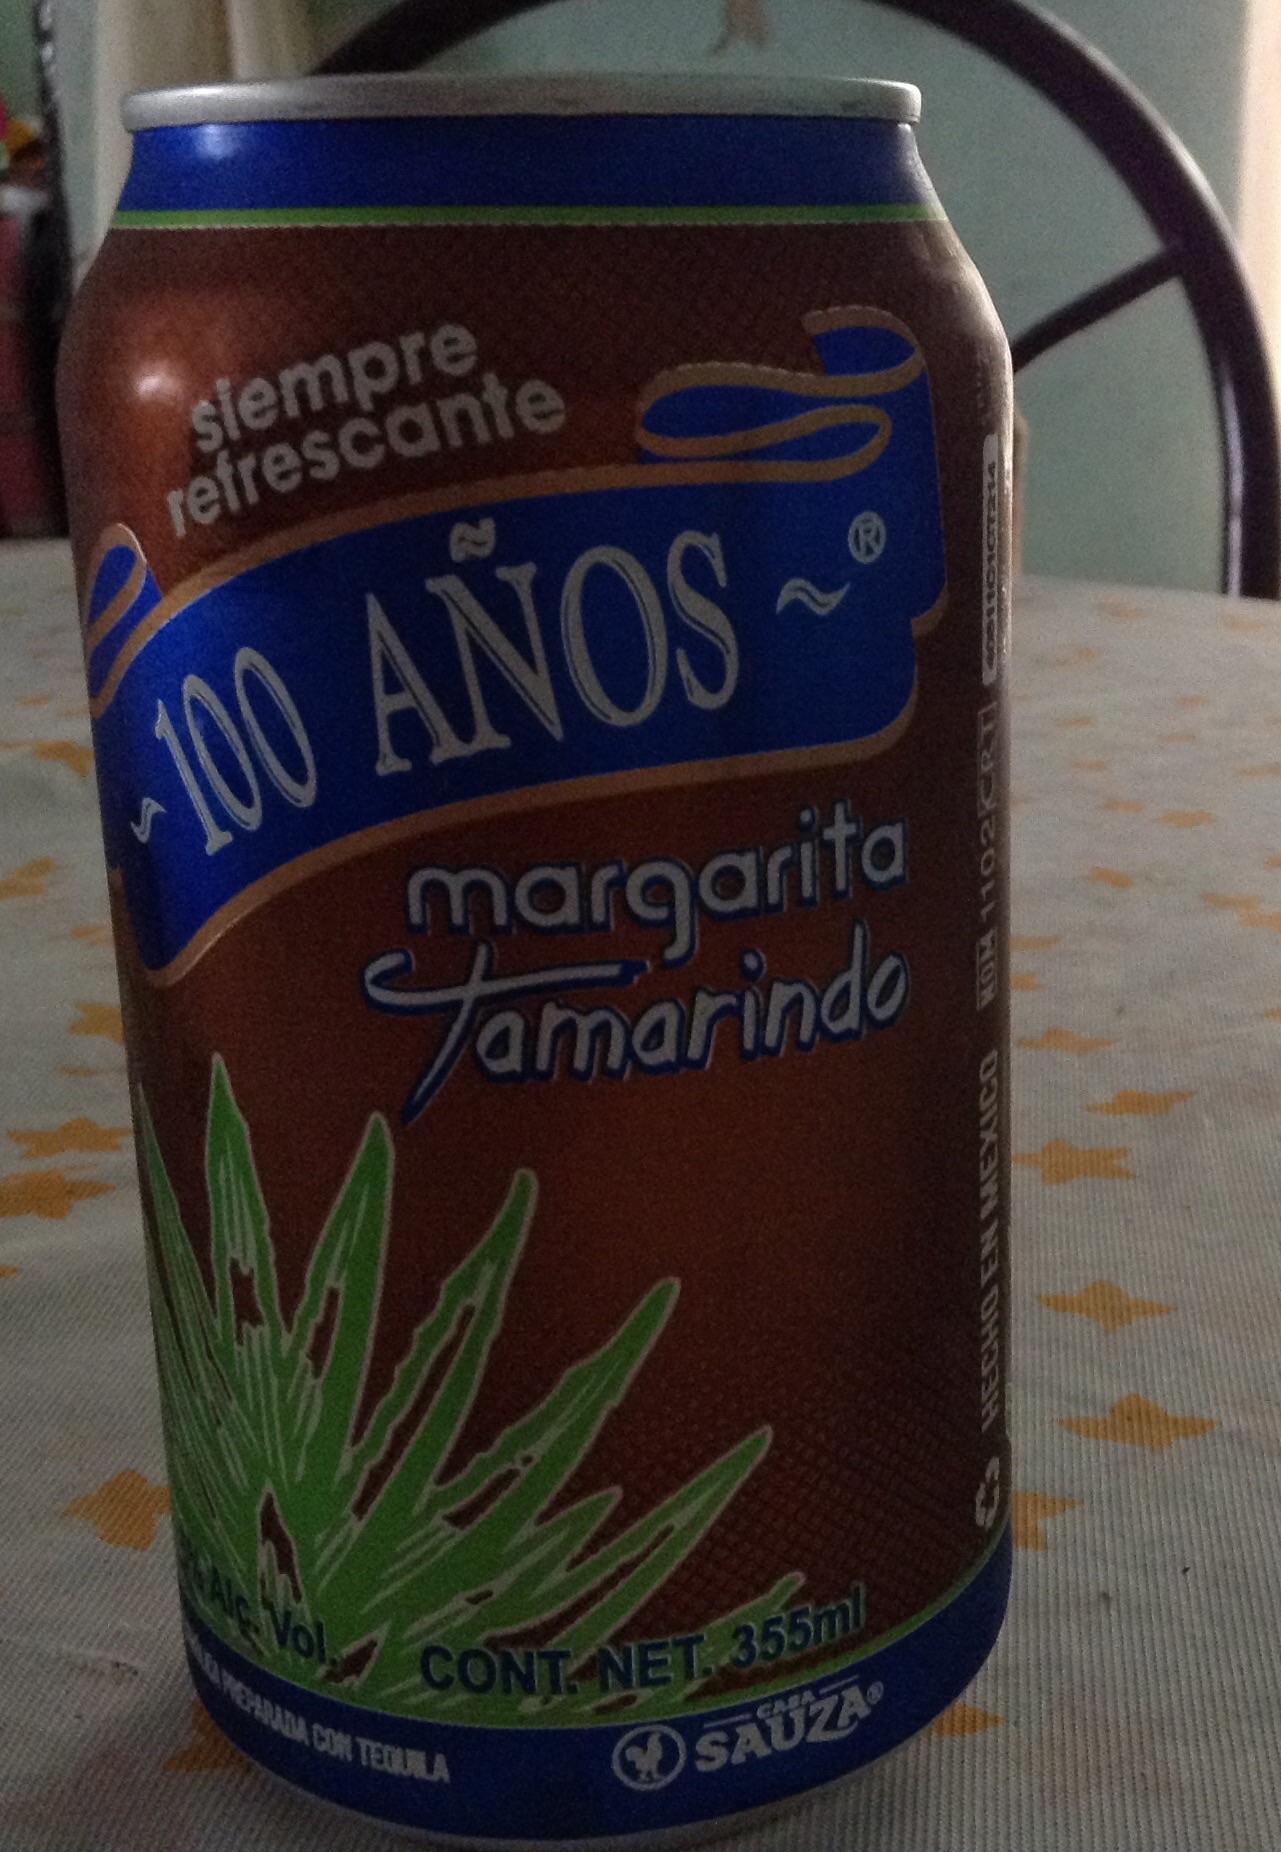 "Bodega Aurrerá: Margarita tamarindo tequila ""100 Años"" $7"